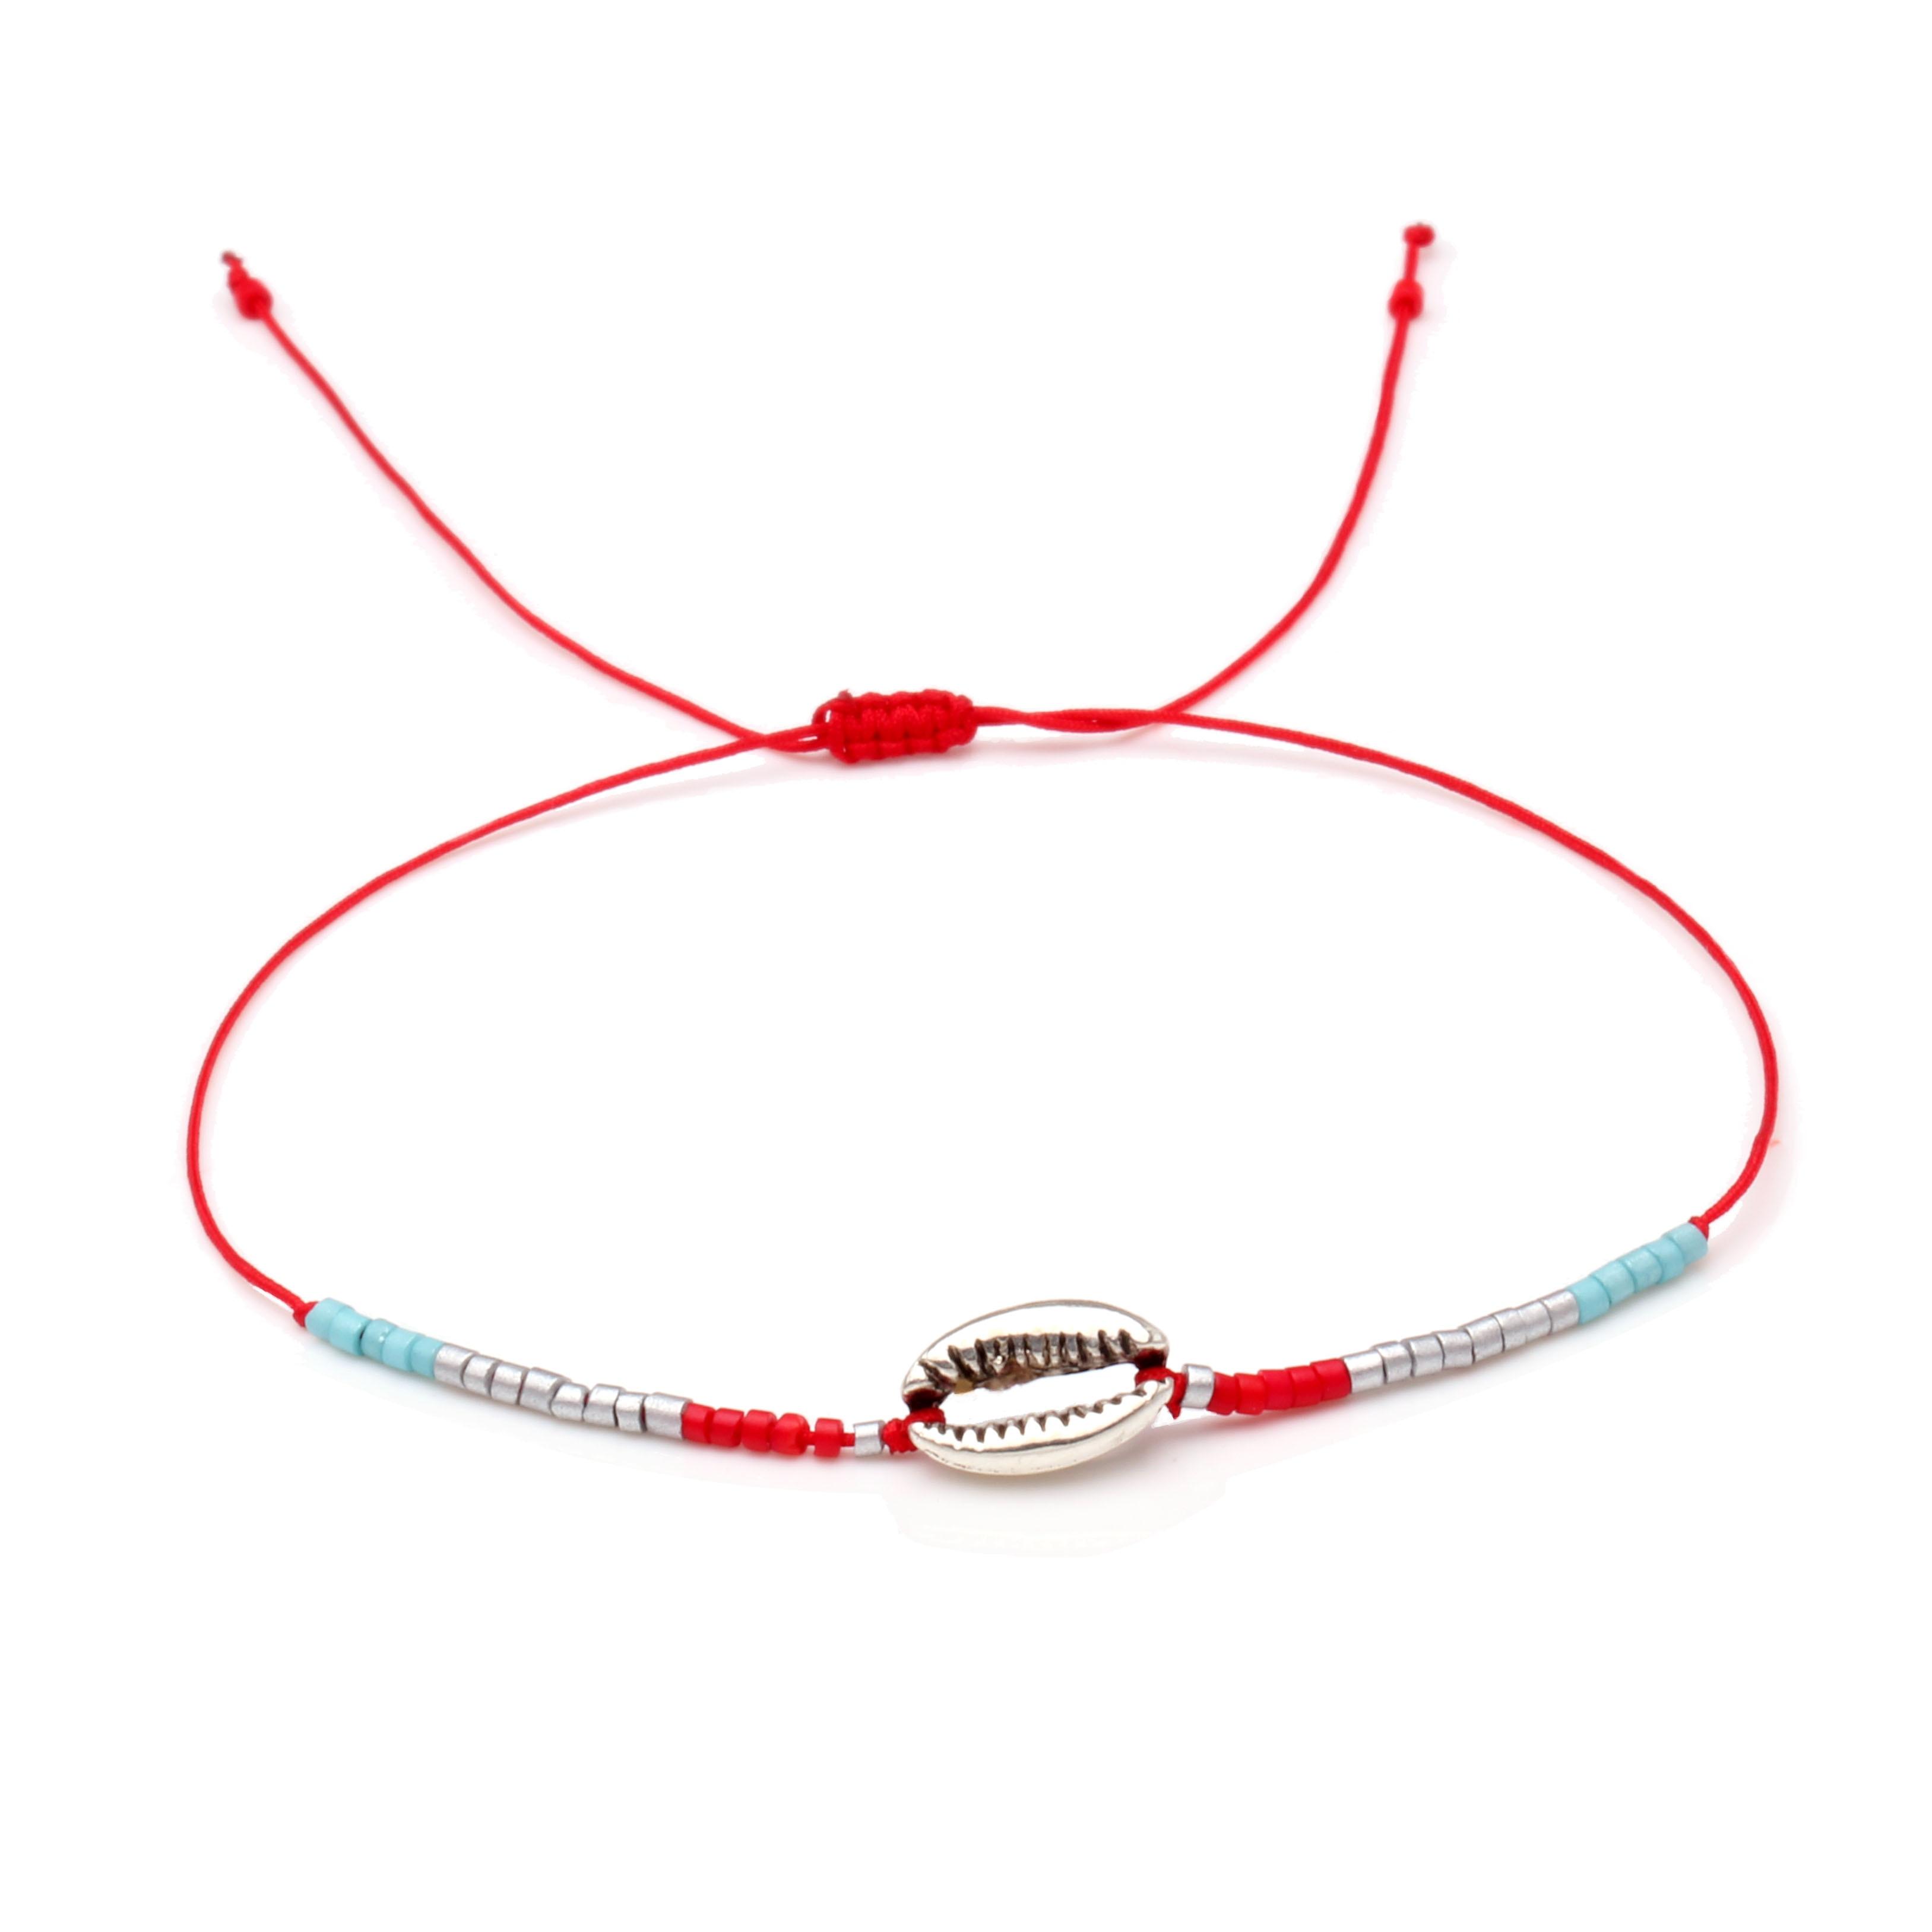 Metal Alloy Shells Miyuki Glass Seed Beads Tiny Bracelet Women Men Gorgeous Dainty Low-key Simple Handmade String Beach Jewelry(China)